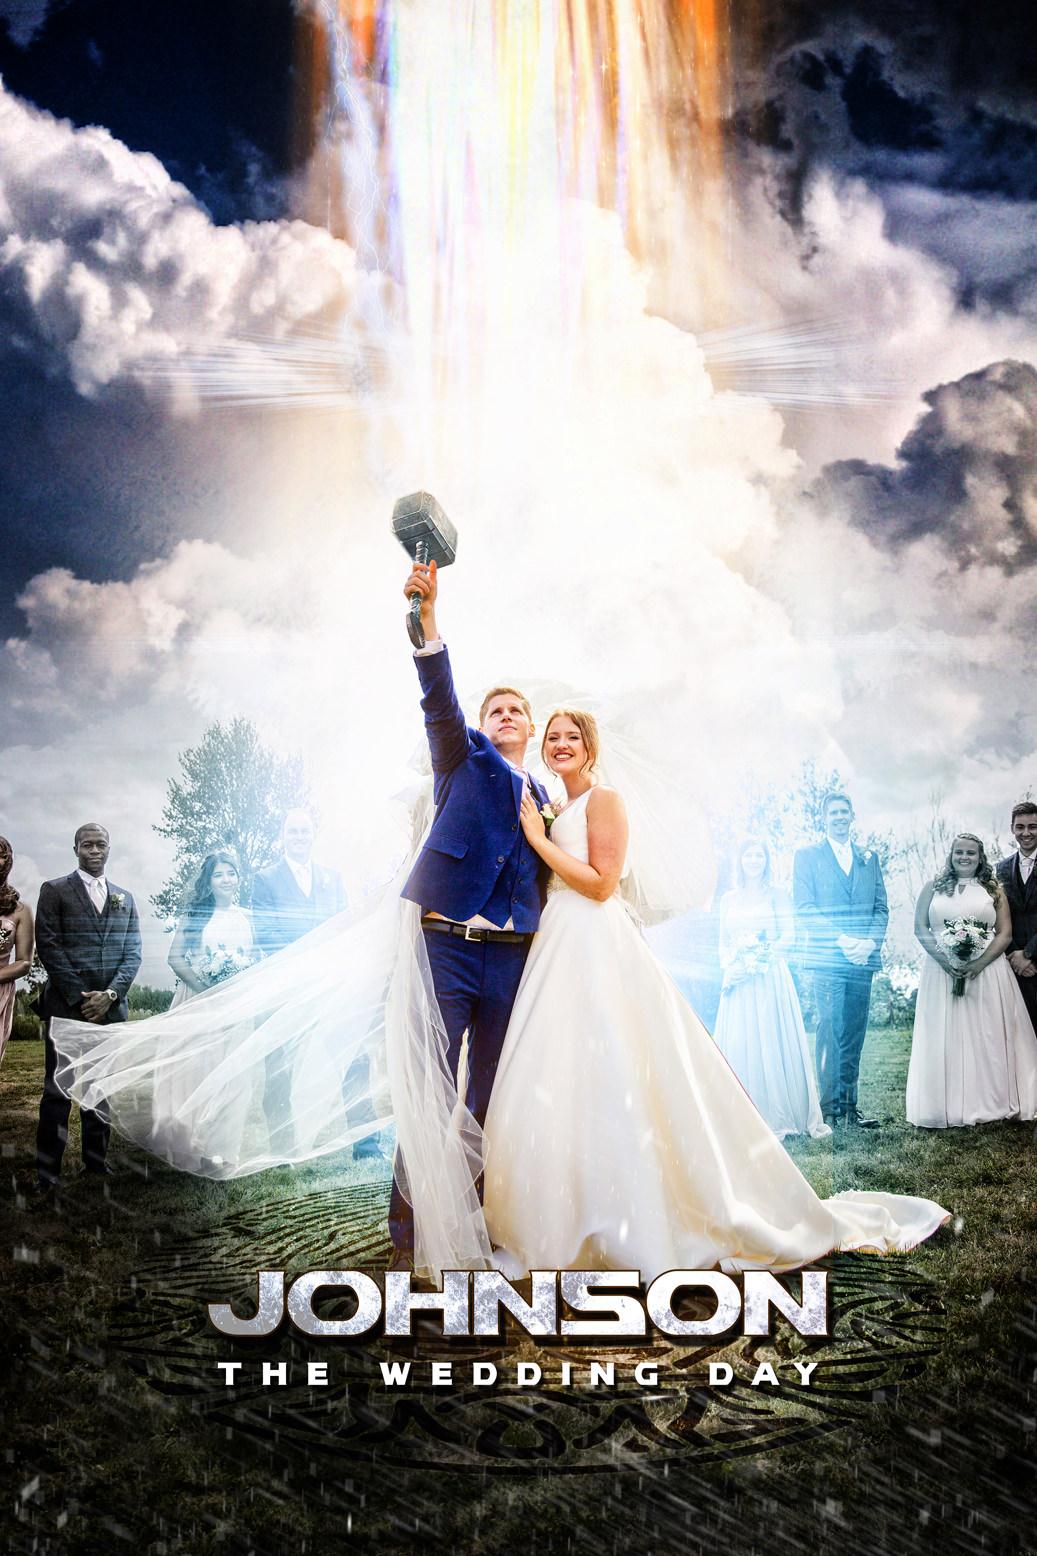 Thor wedding photo